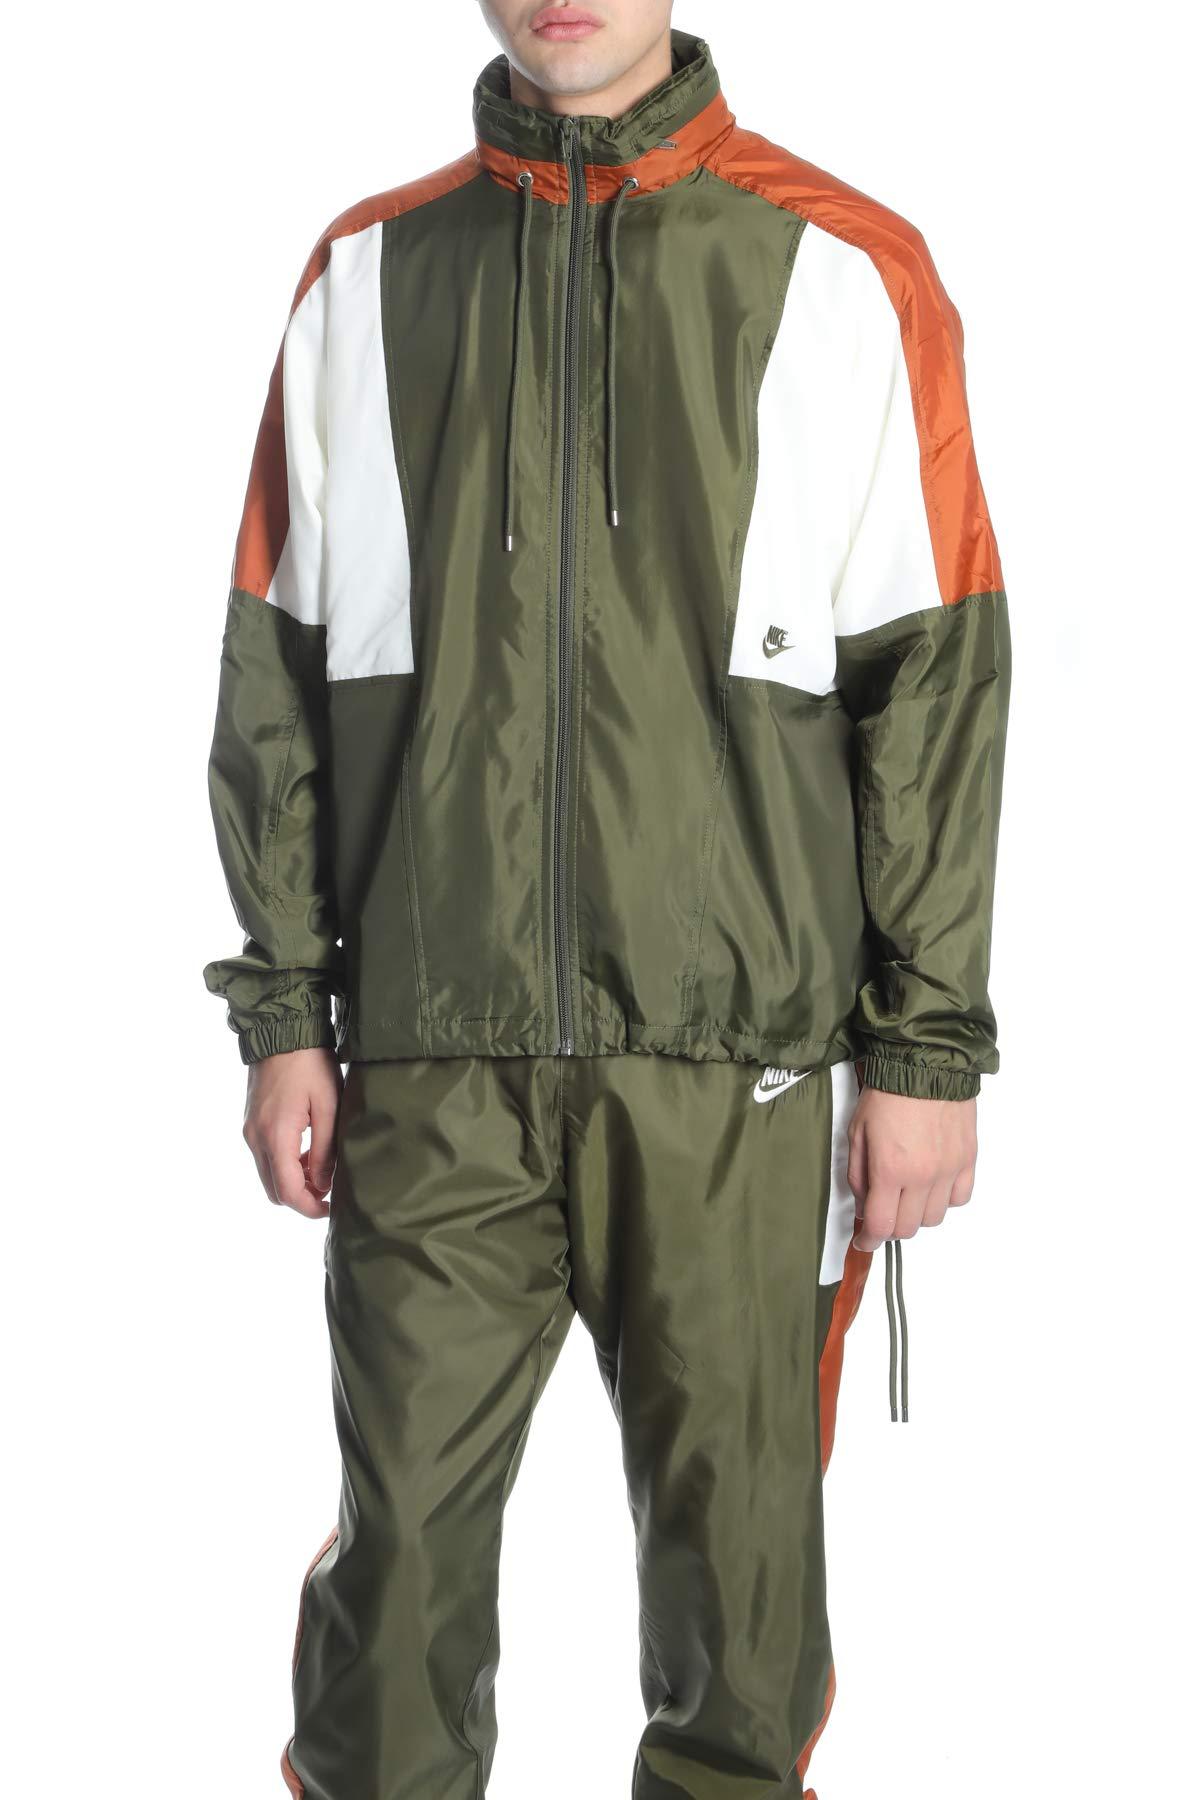 NIKE Sportswear Woven Men's Jacket (Olive Canvas/Dark Russet/Sail, Medium)